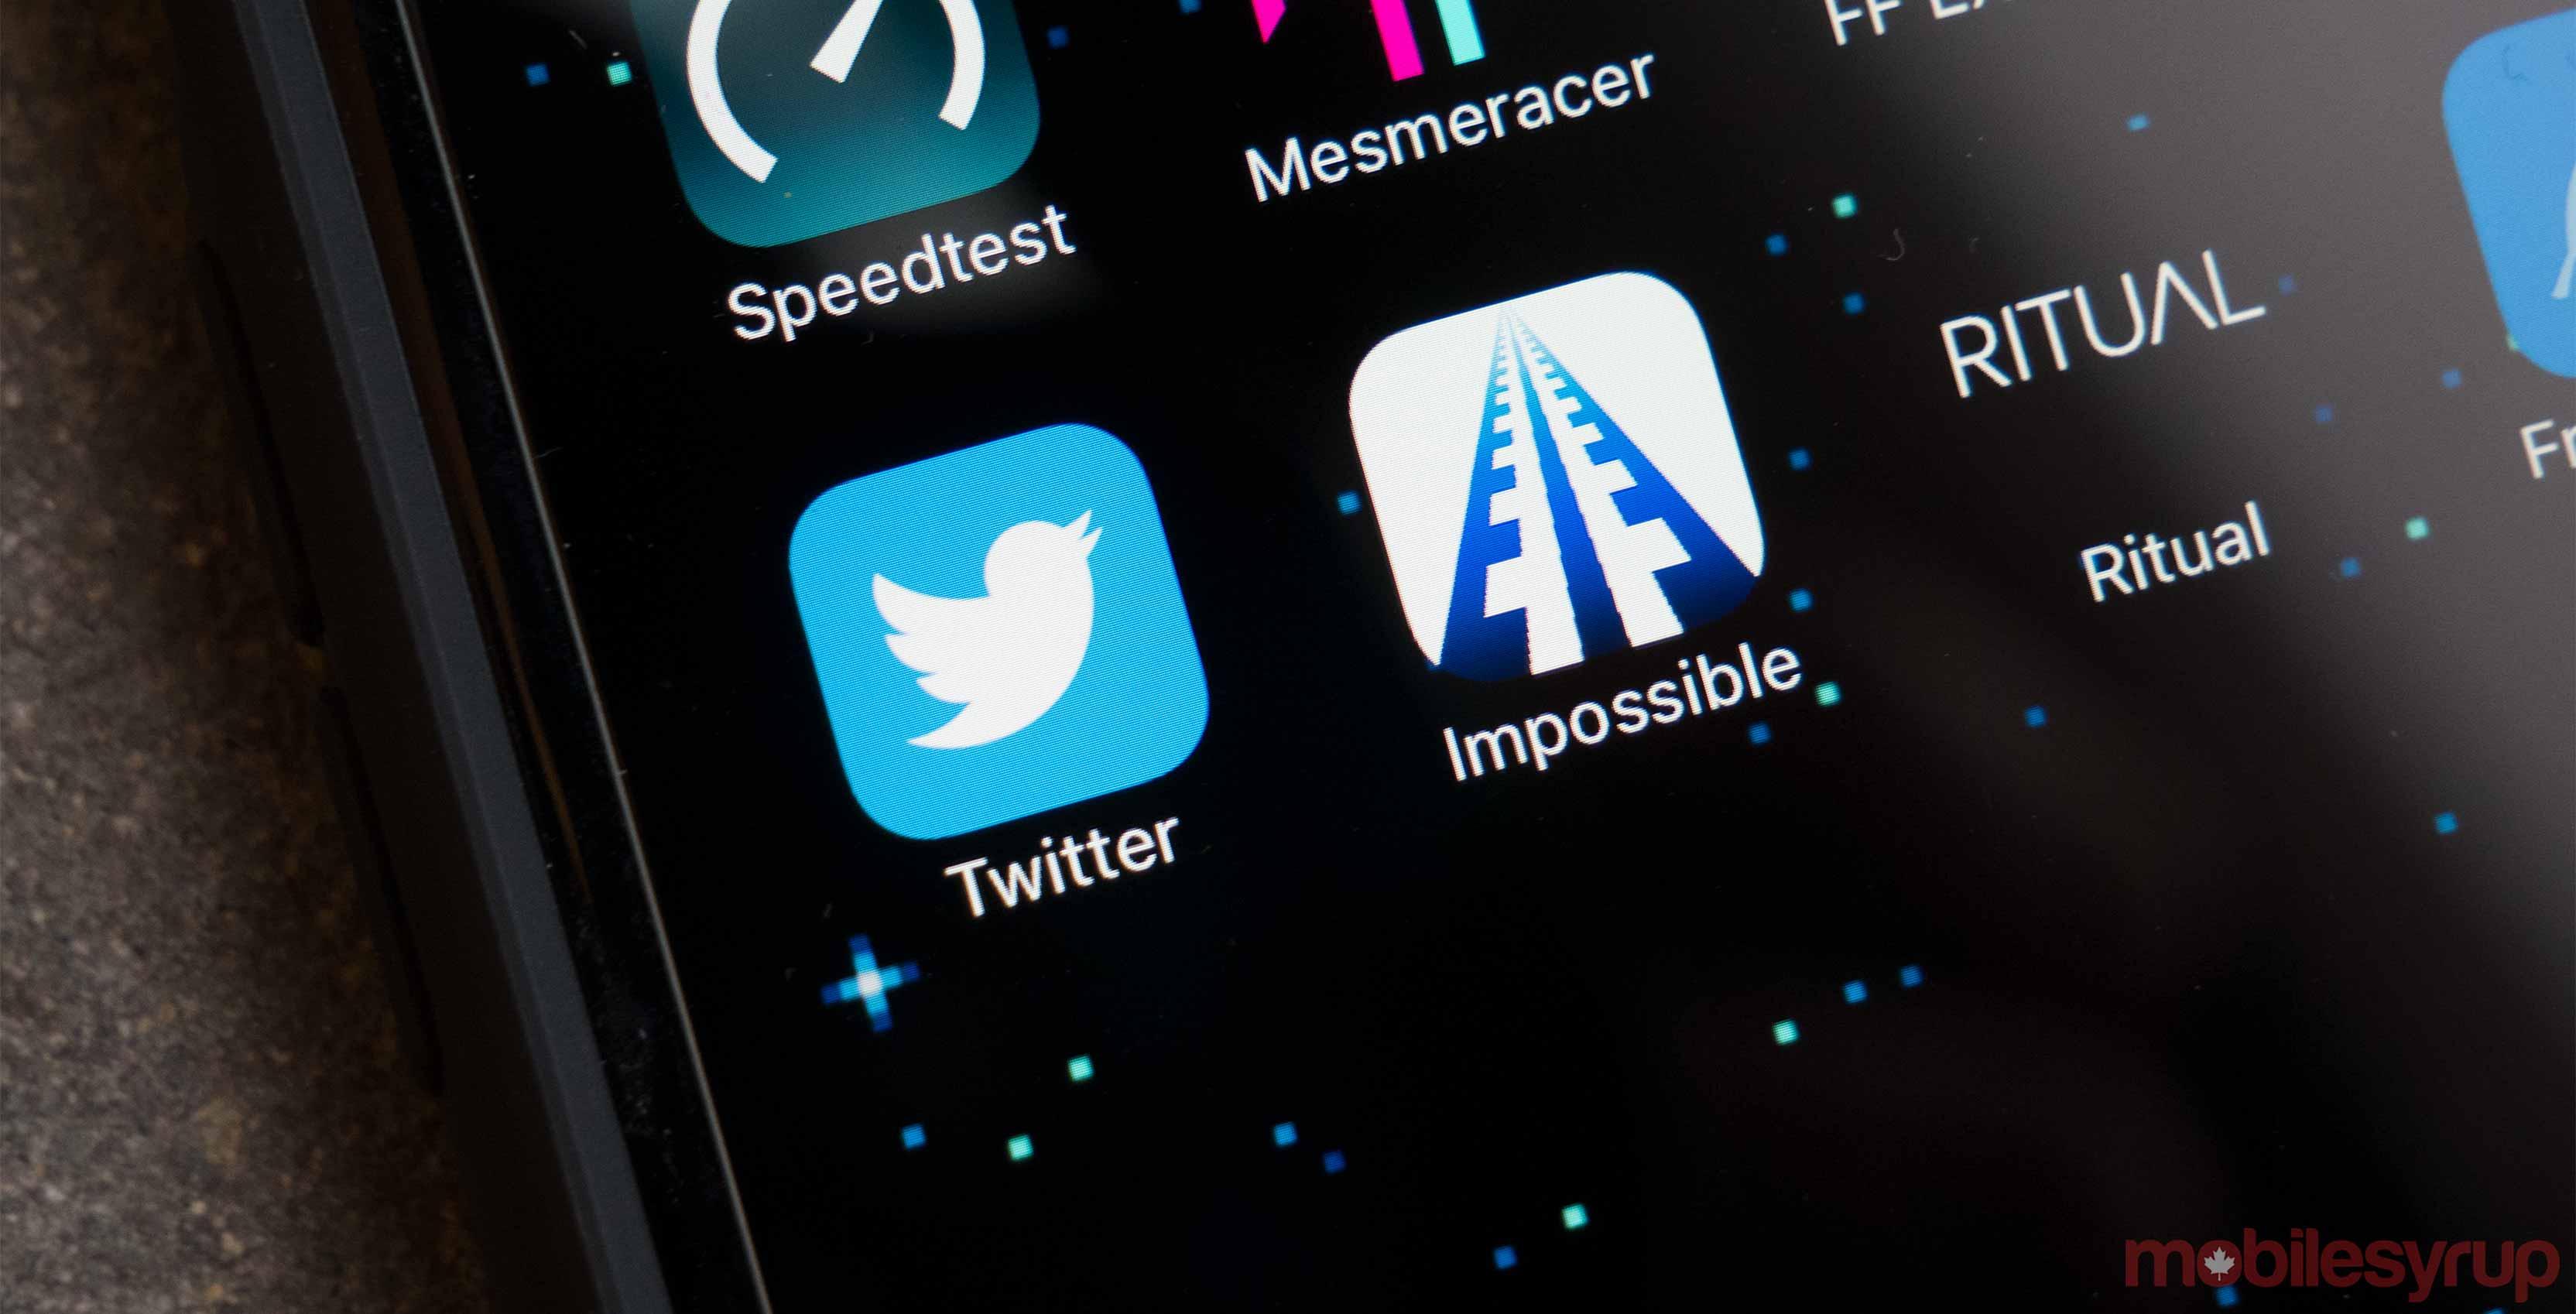 Twitter app photo